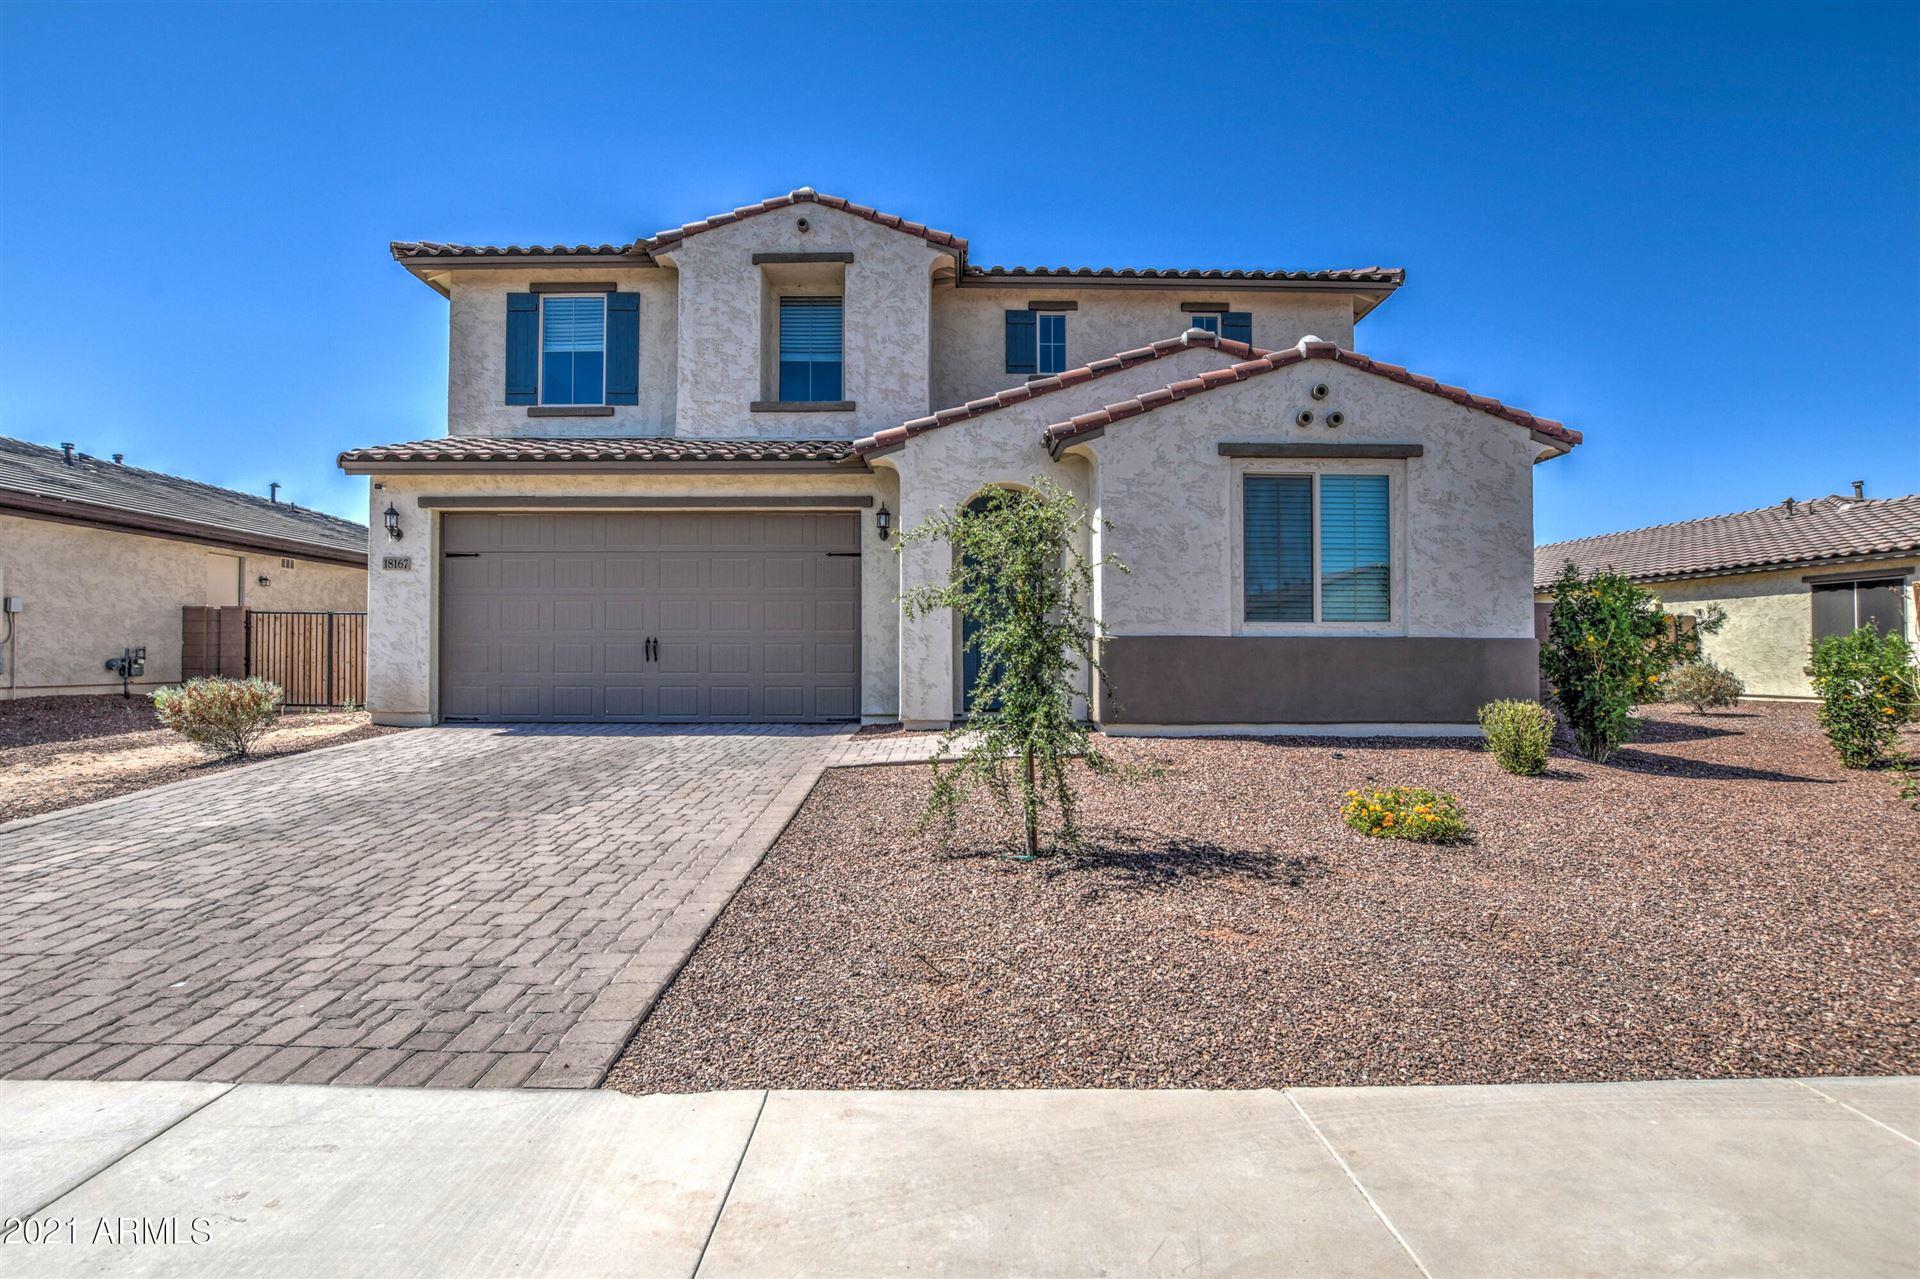 Photo of 18167 W RAYMOND Street, Goodyear, AZ 85338 (MLS # 6246713)